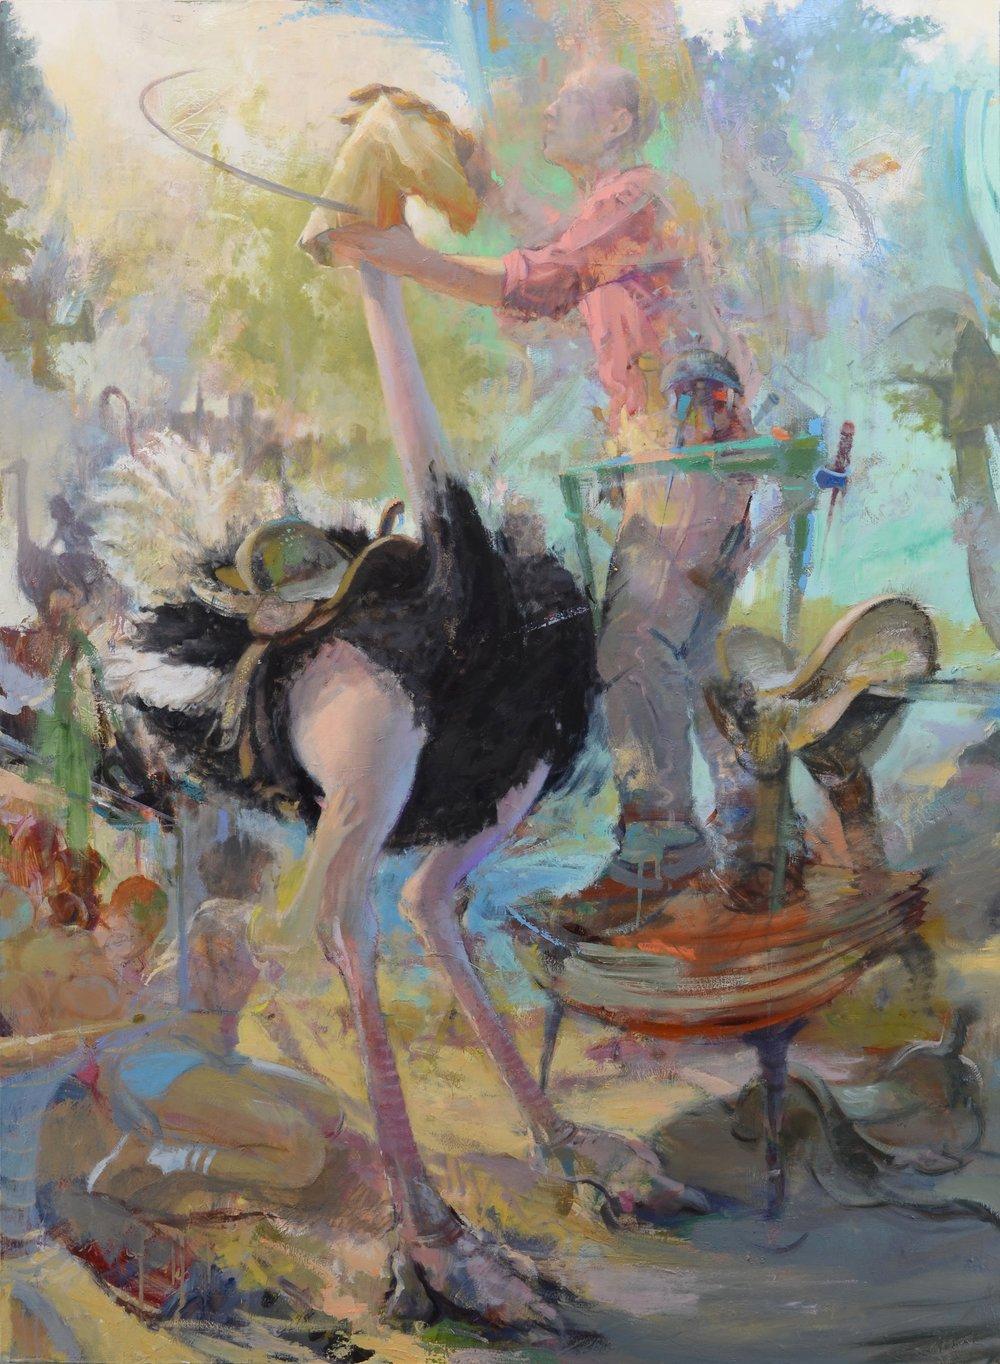 Saddler , 2018  oil on canvas  60 x 44 in.